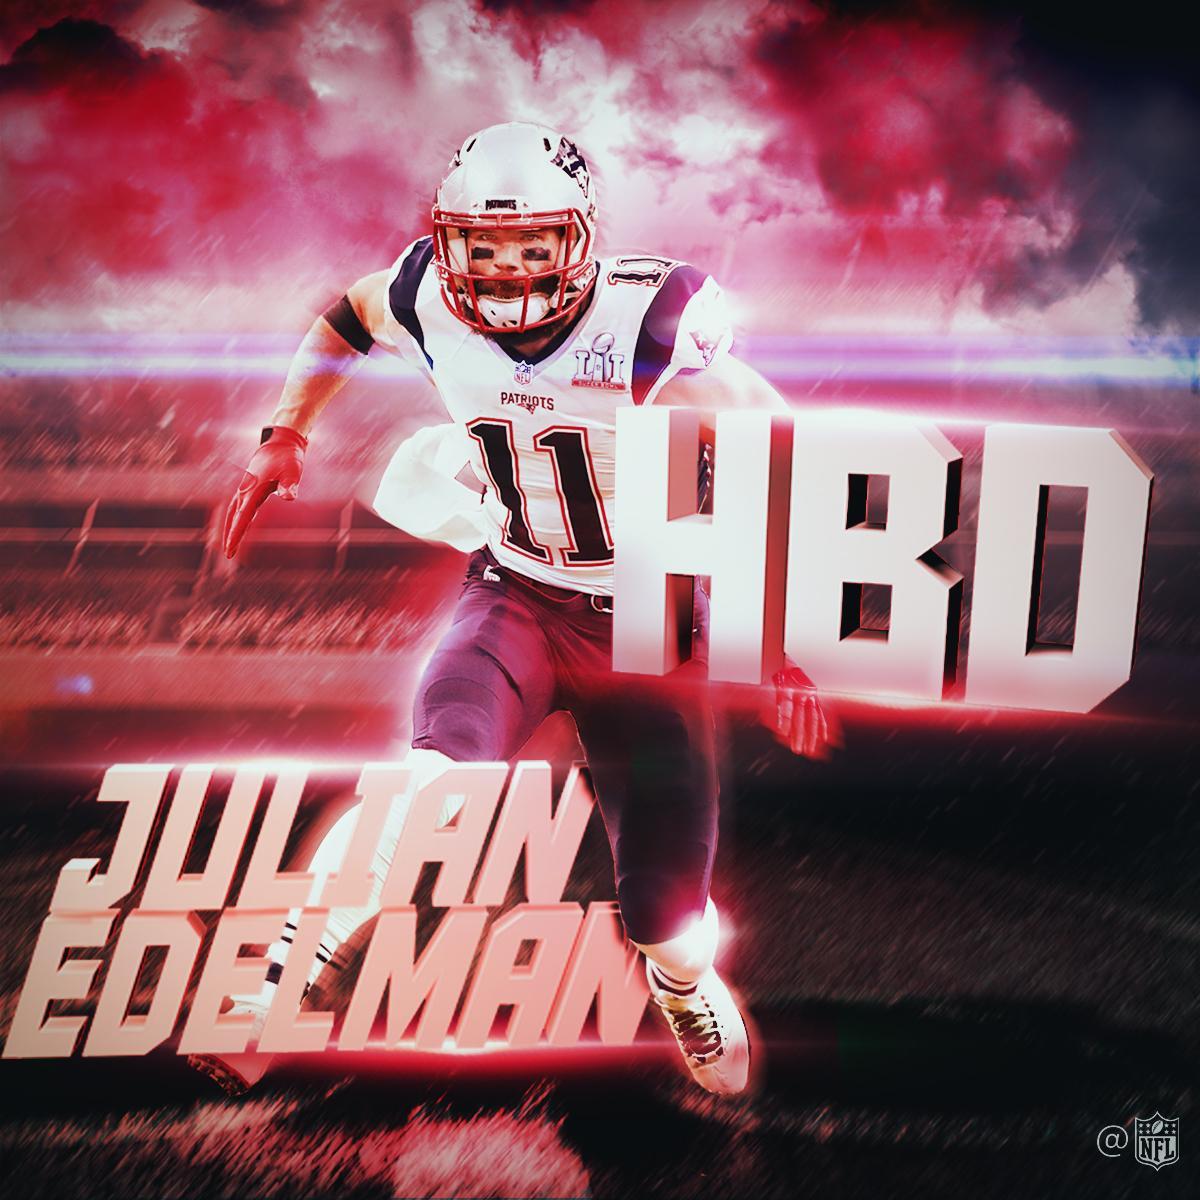 HAPPY BIRTHDAY to 2x @SuperBowl champion + @Patriots WR @Edelman11! �� https://t.co/hmFhqQDwsx